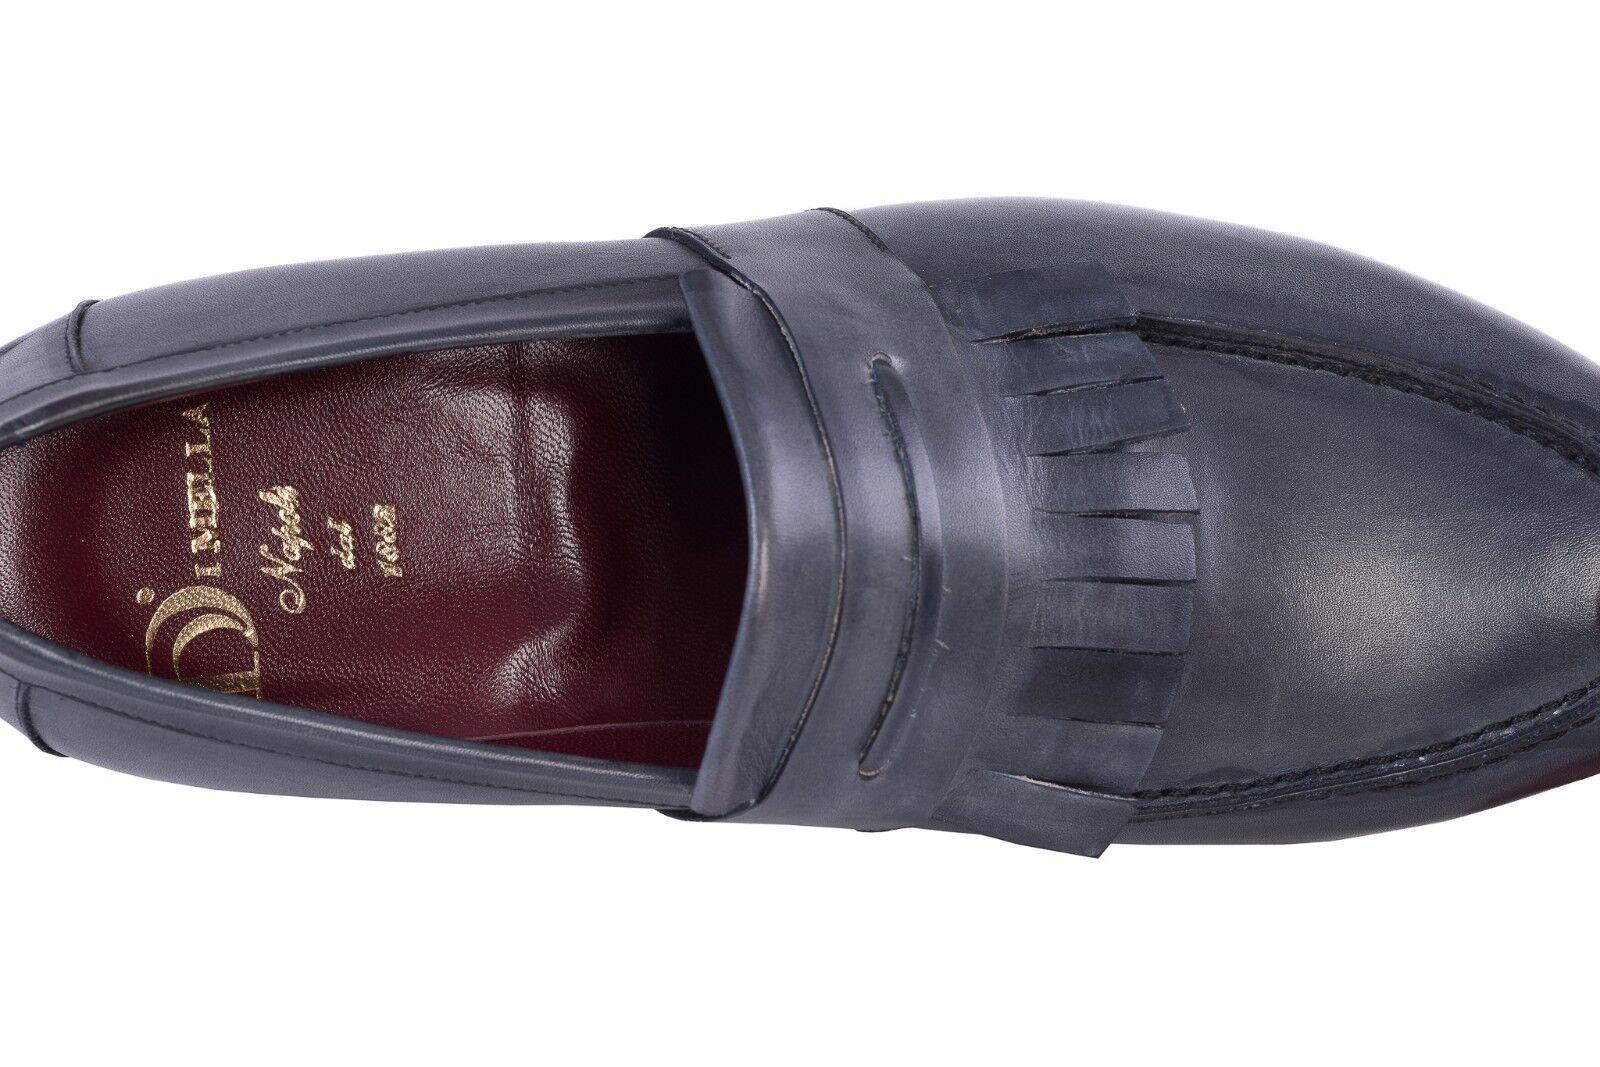 450  DI MELLA NAPOLI Tassel Tassel Tassel Loafer schuhe Antiqued Blau 8.5 US   7.5 UK   41.5 IT c04ed5